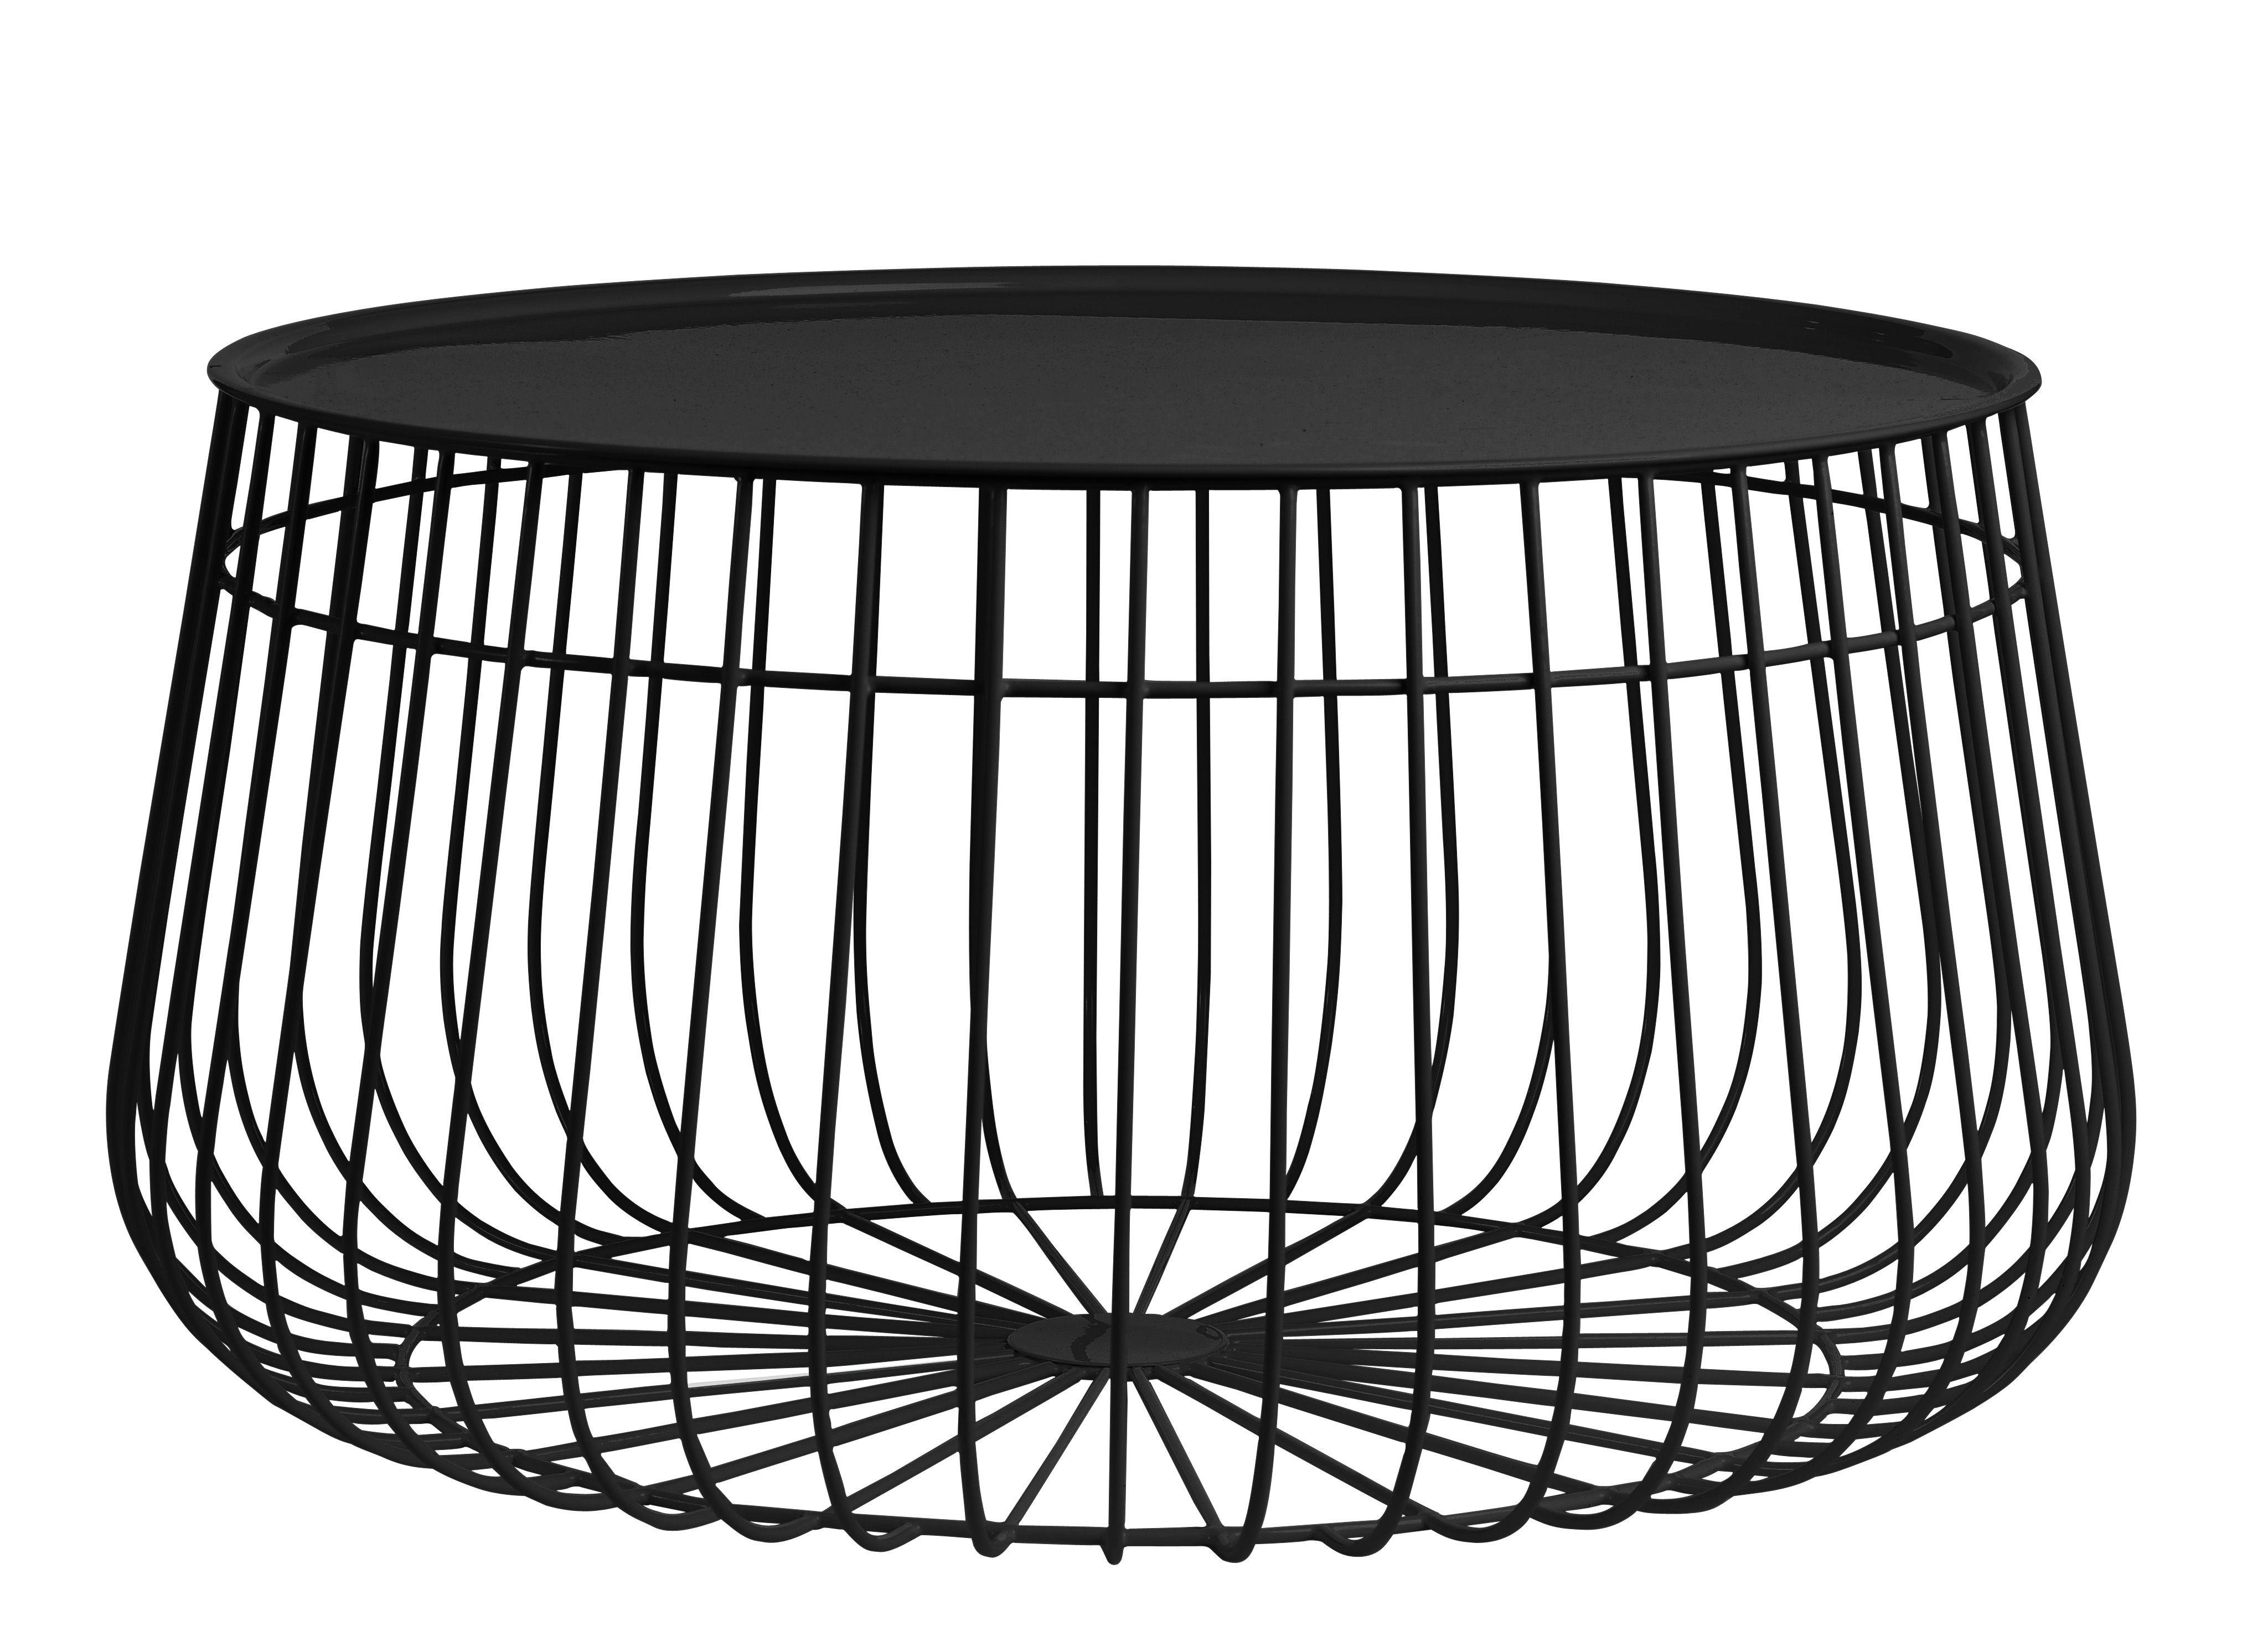 Wire  abnehmbare Tischplatte  Ø 62 x H 35 cm  Pols